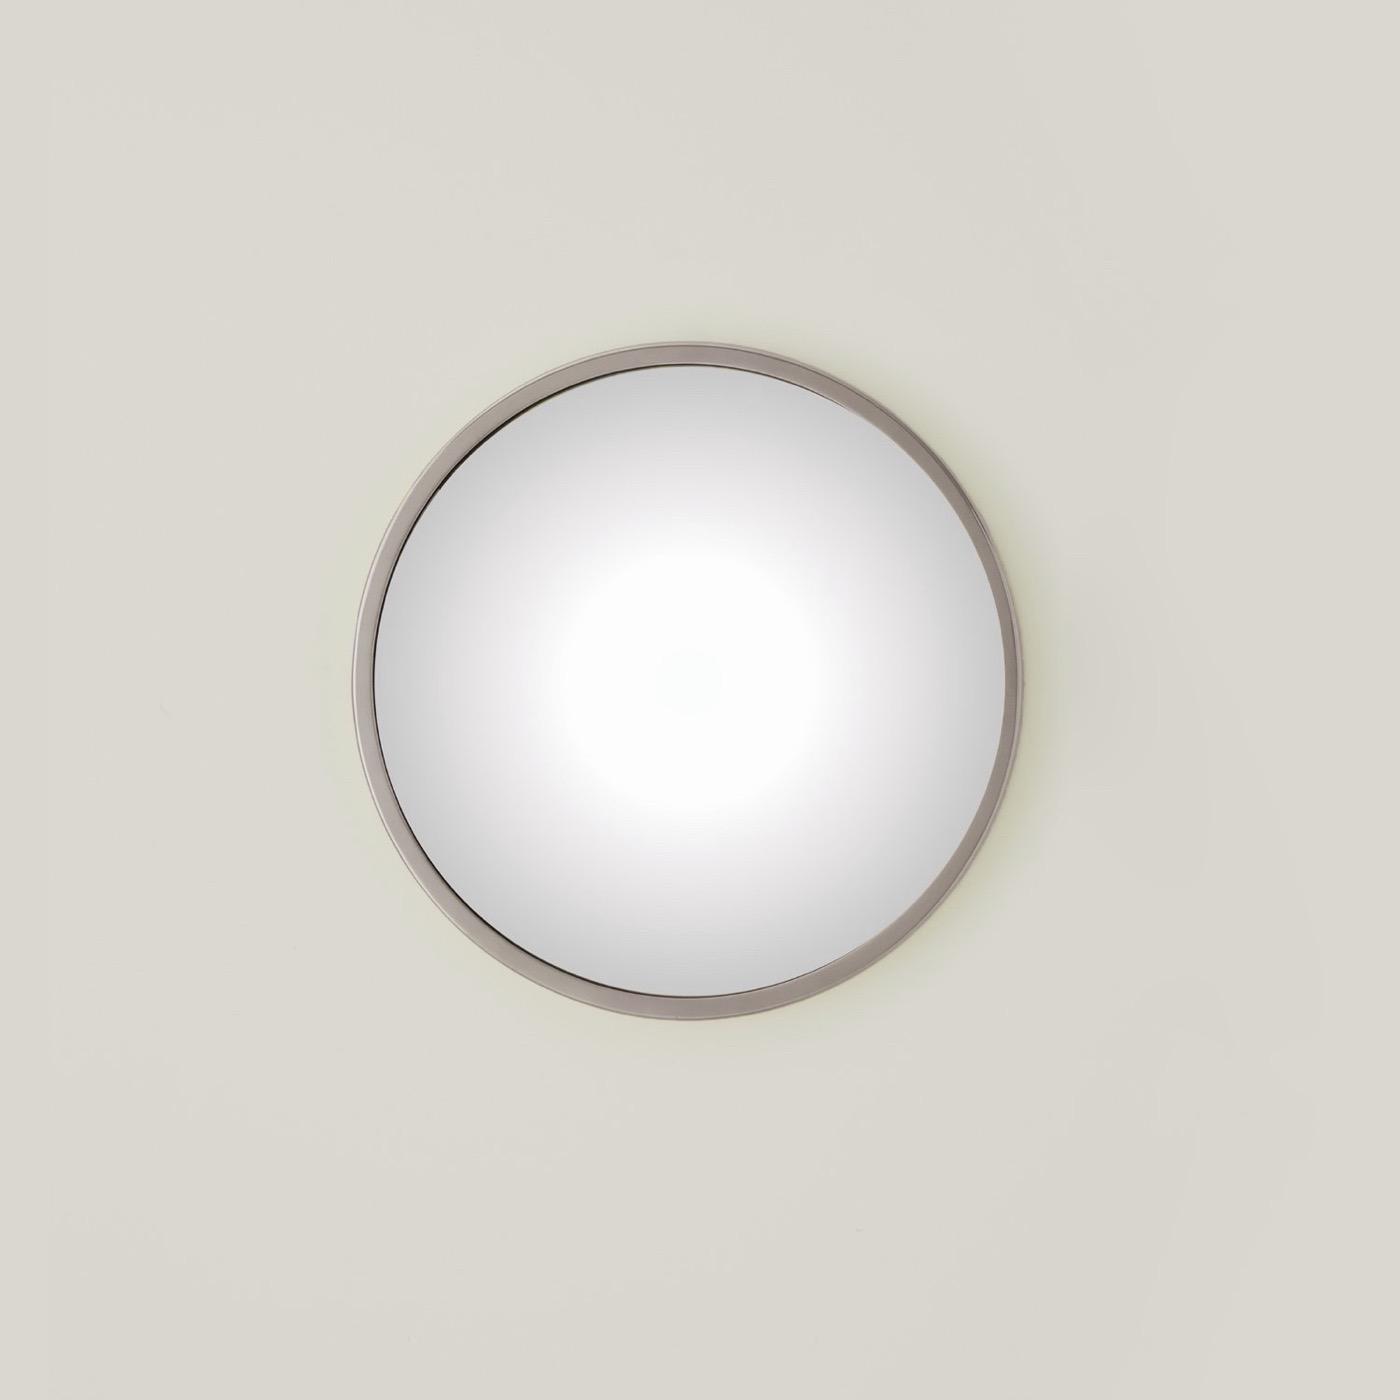 Lamar Wall Mirrors | Nickel